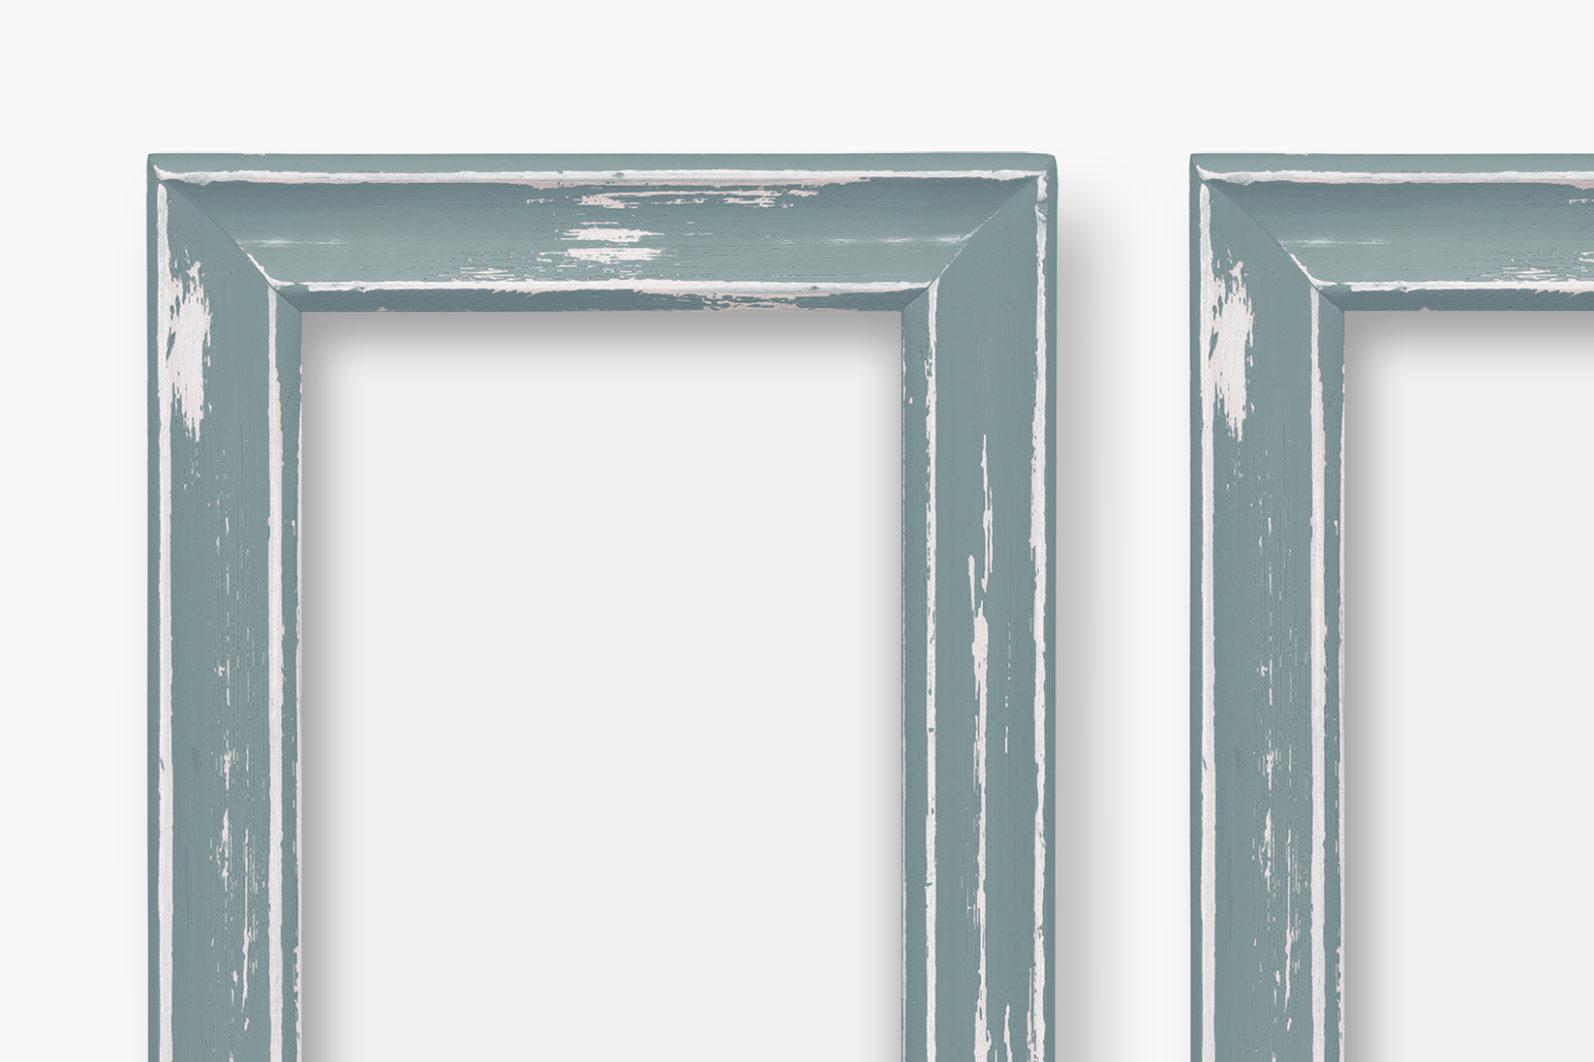 Frame Mockup, Blue Wood Portrait Photo Frame, Two Frame Mockup, PSD - Wood Series 1 Preview 6 -